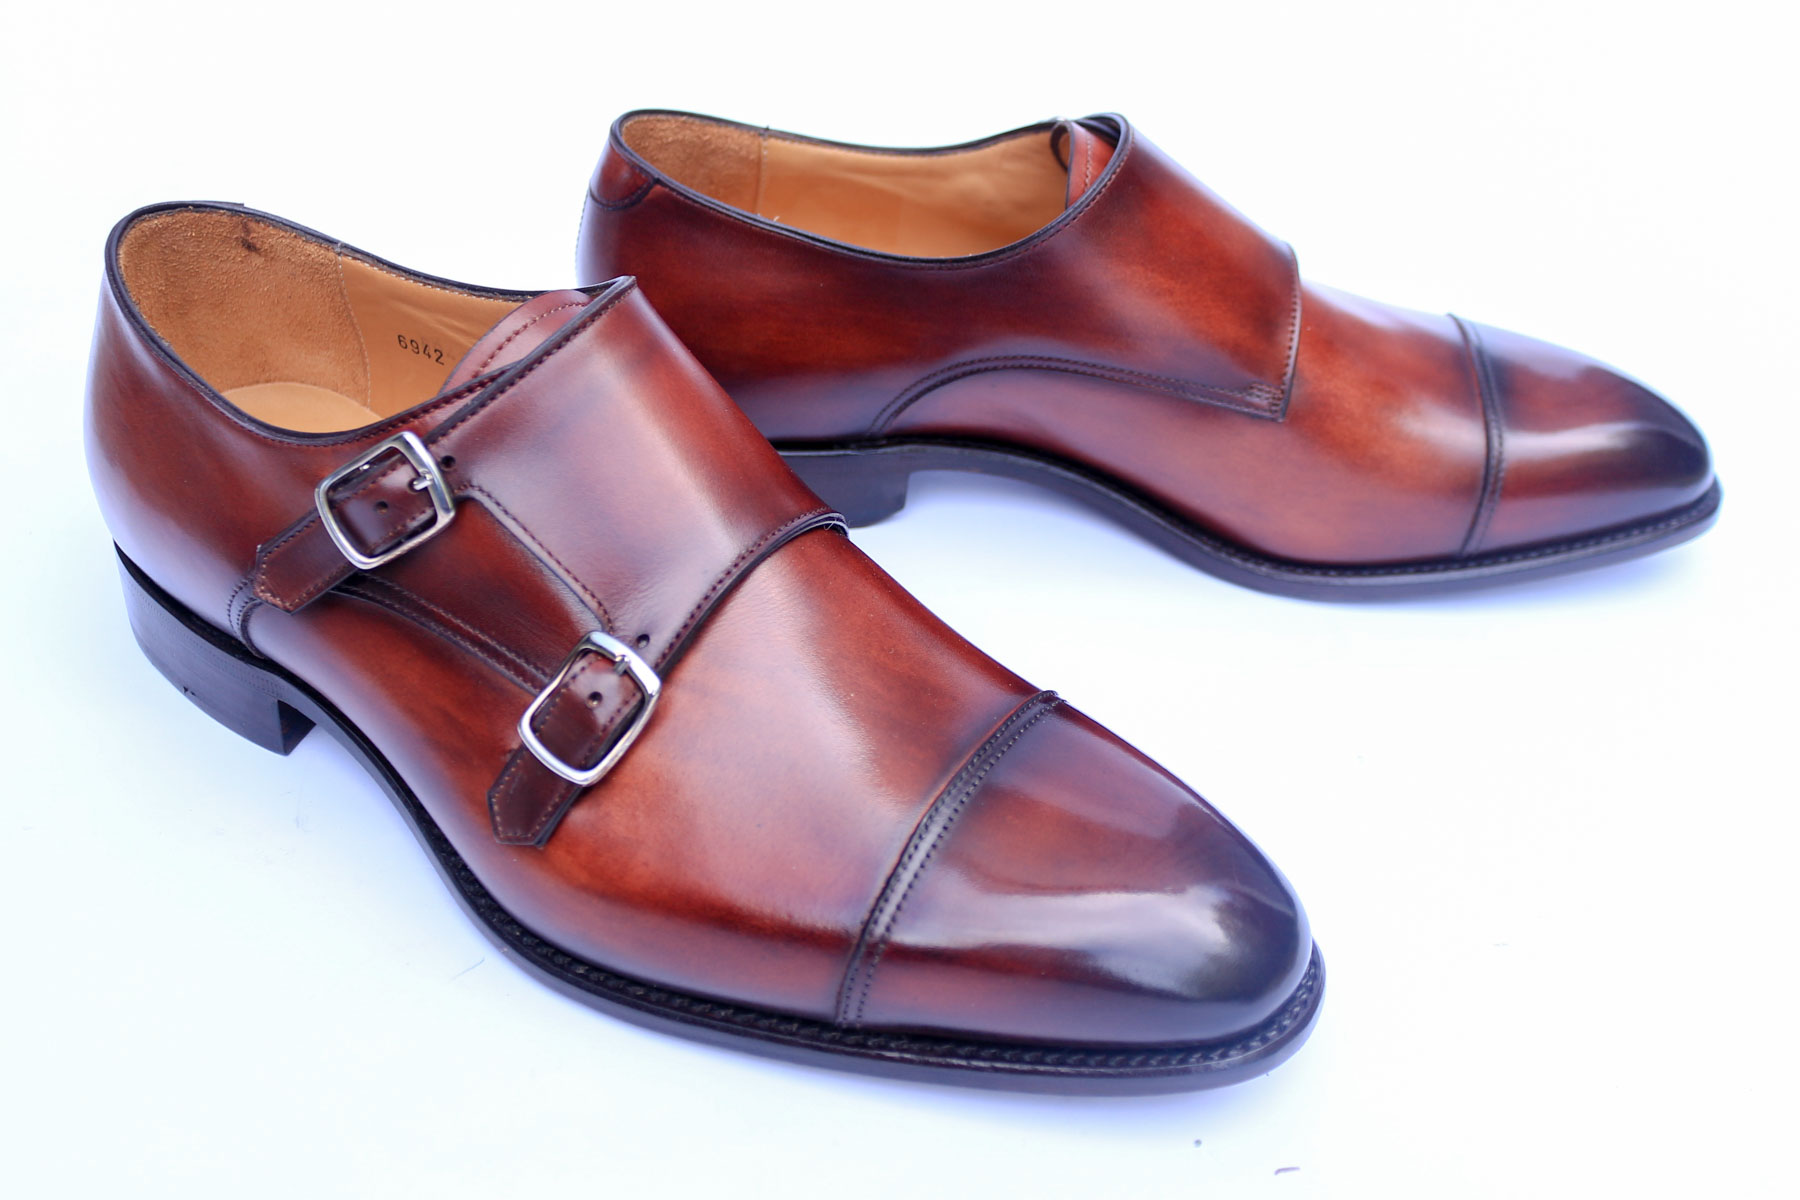 ganska billigt affär exklusiva skor Carlos Santos Shoes Review: Double Monk Straps In Wine Shadow Patina